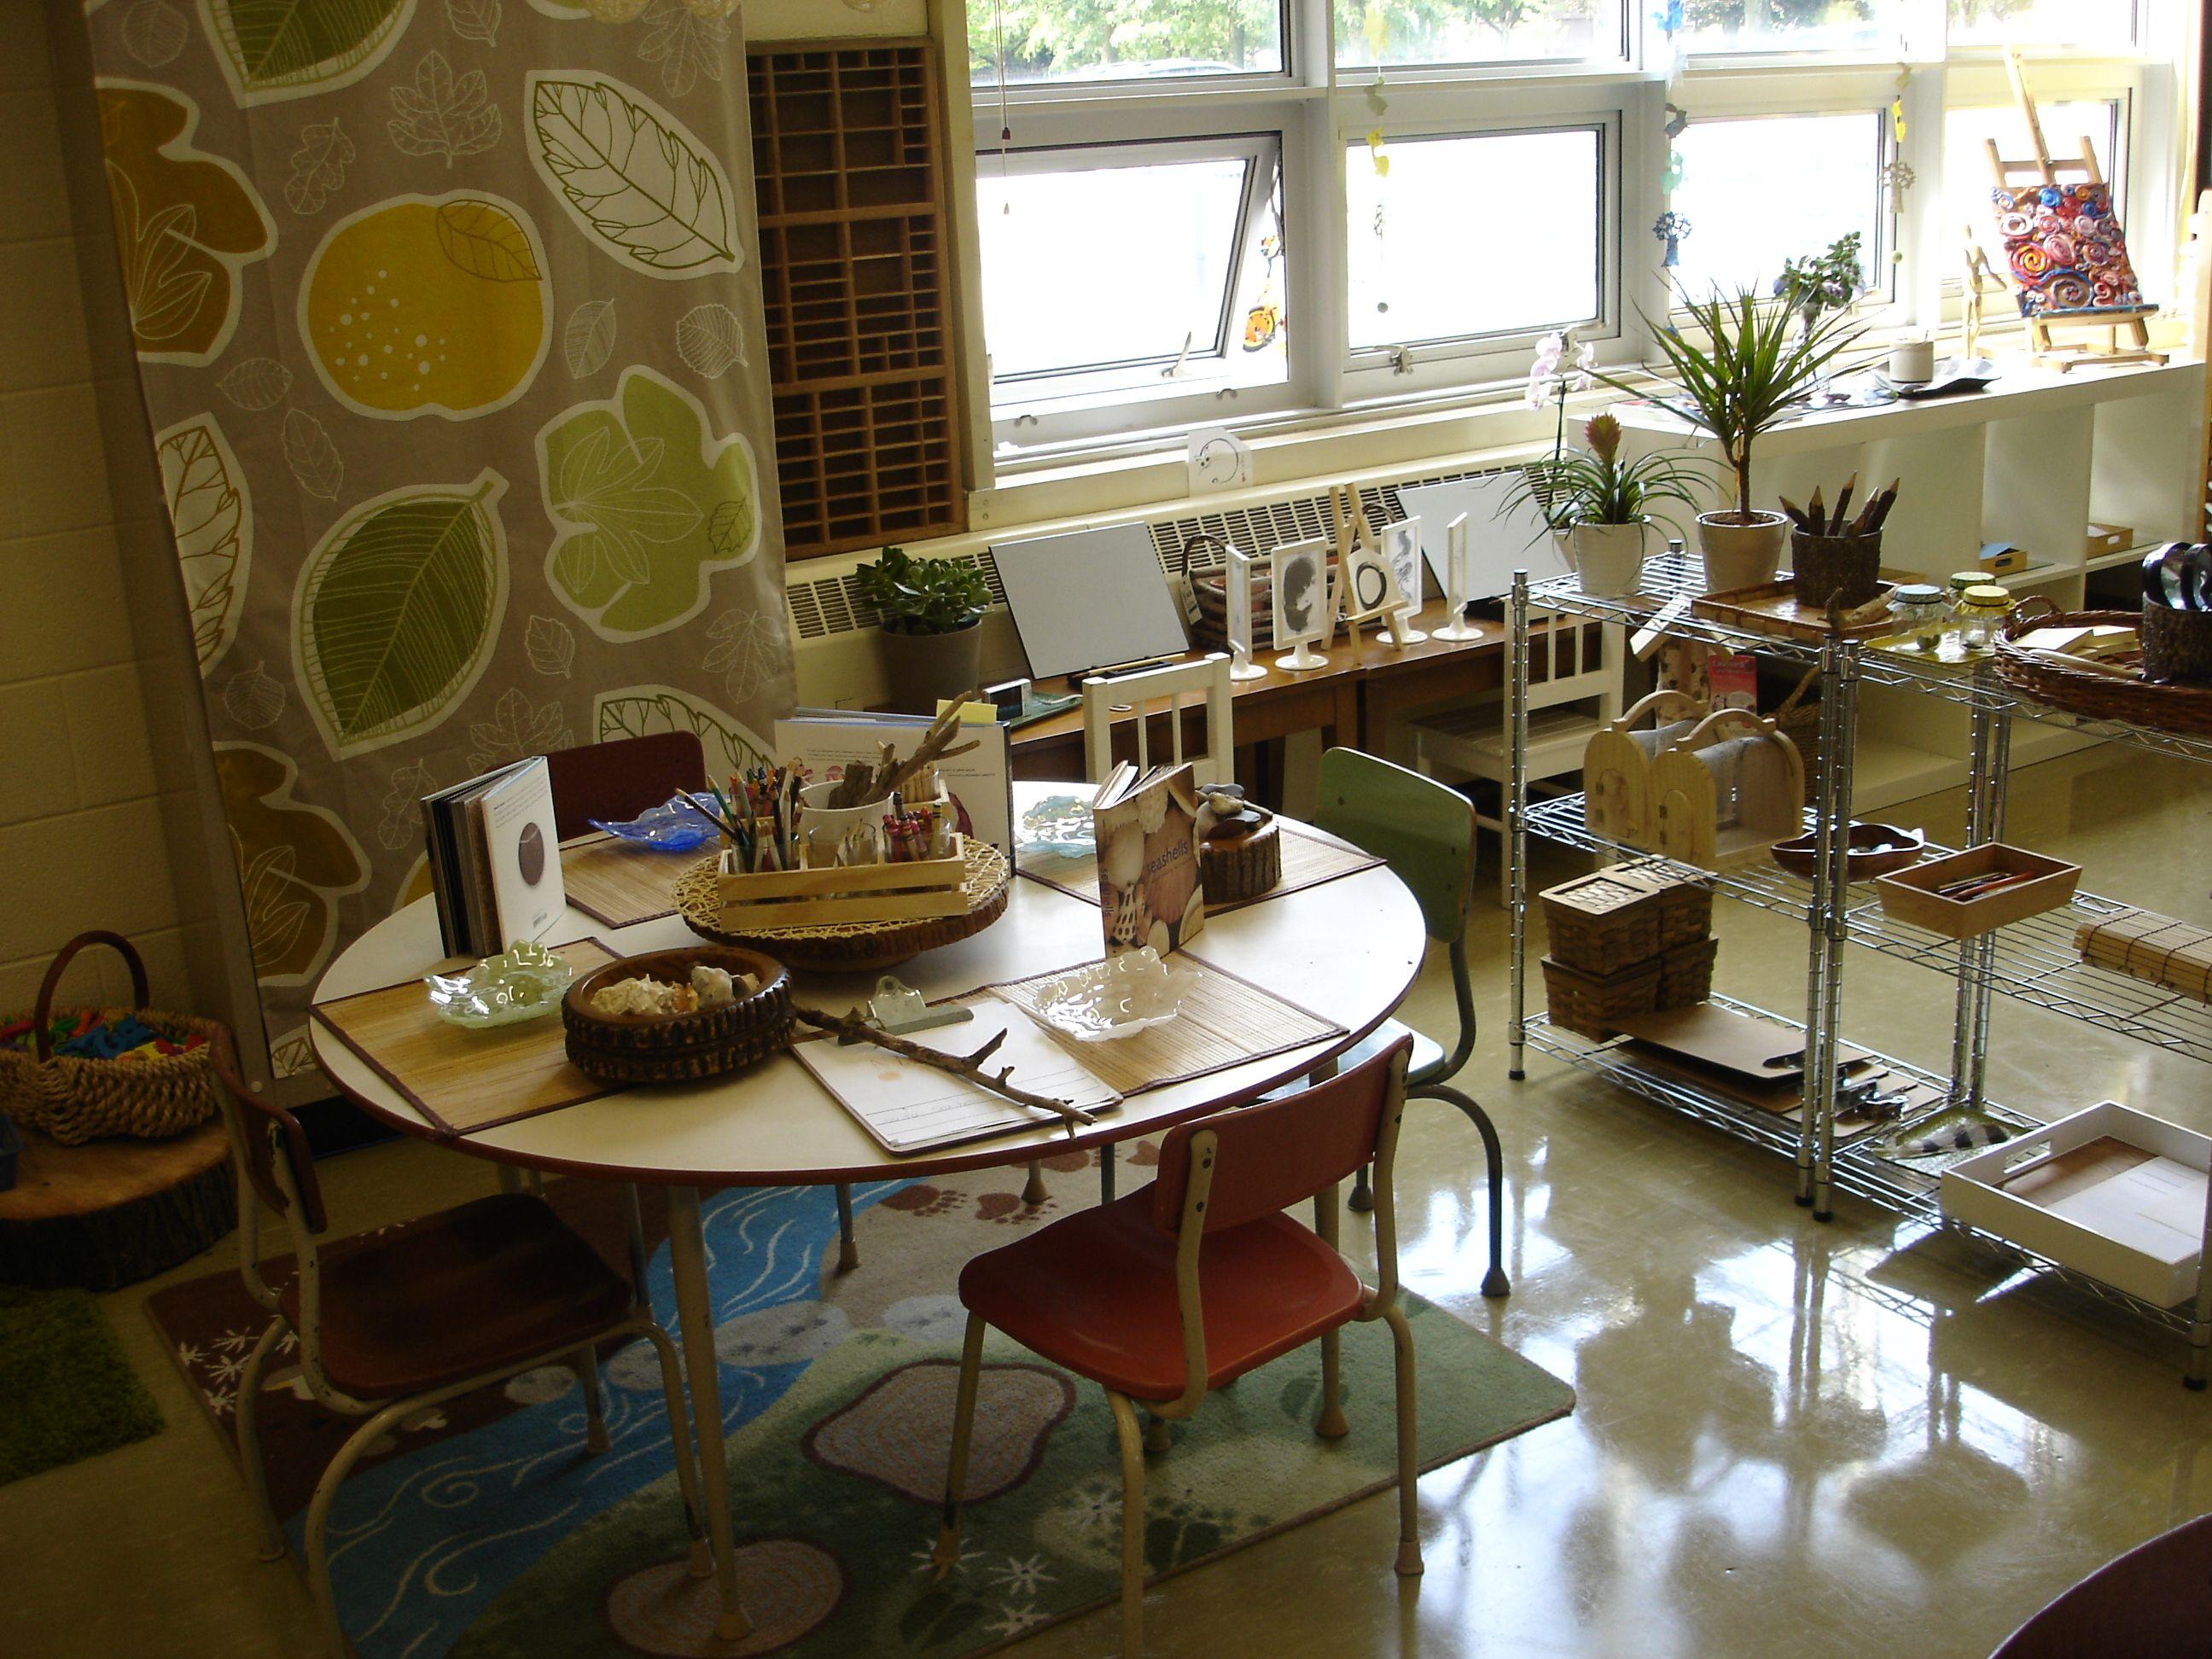 Classroom Environment Ideas ~ A new year classroom ideas pinterest